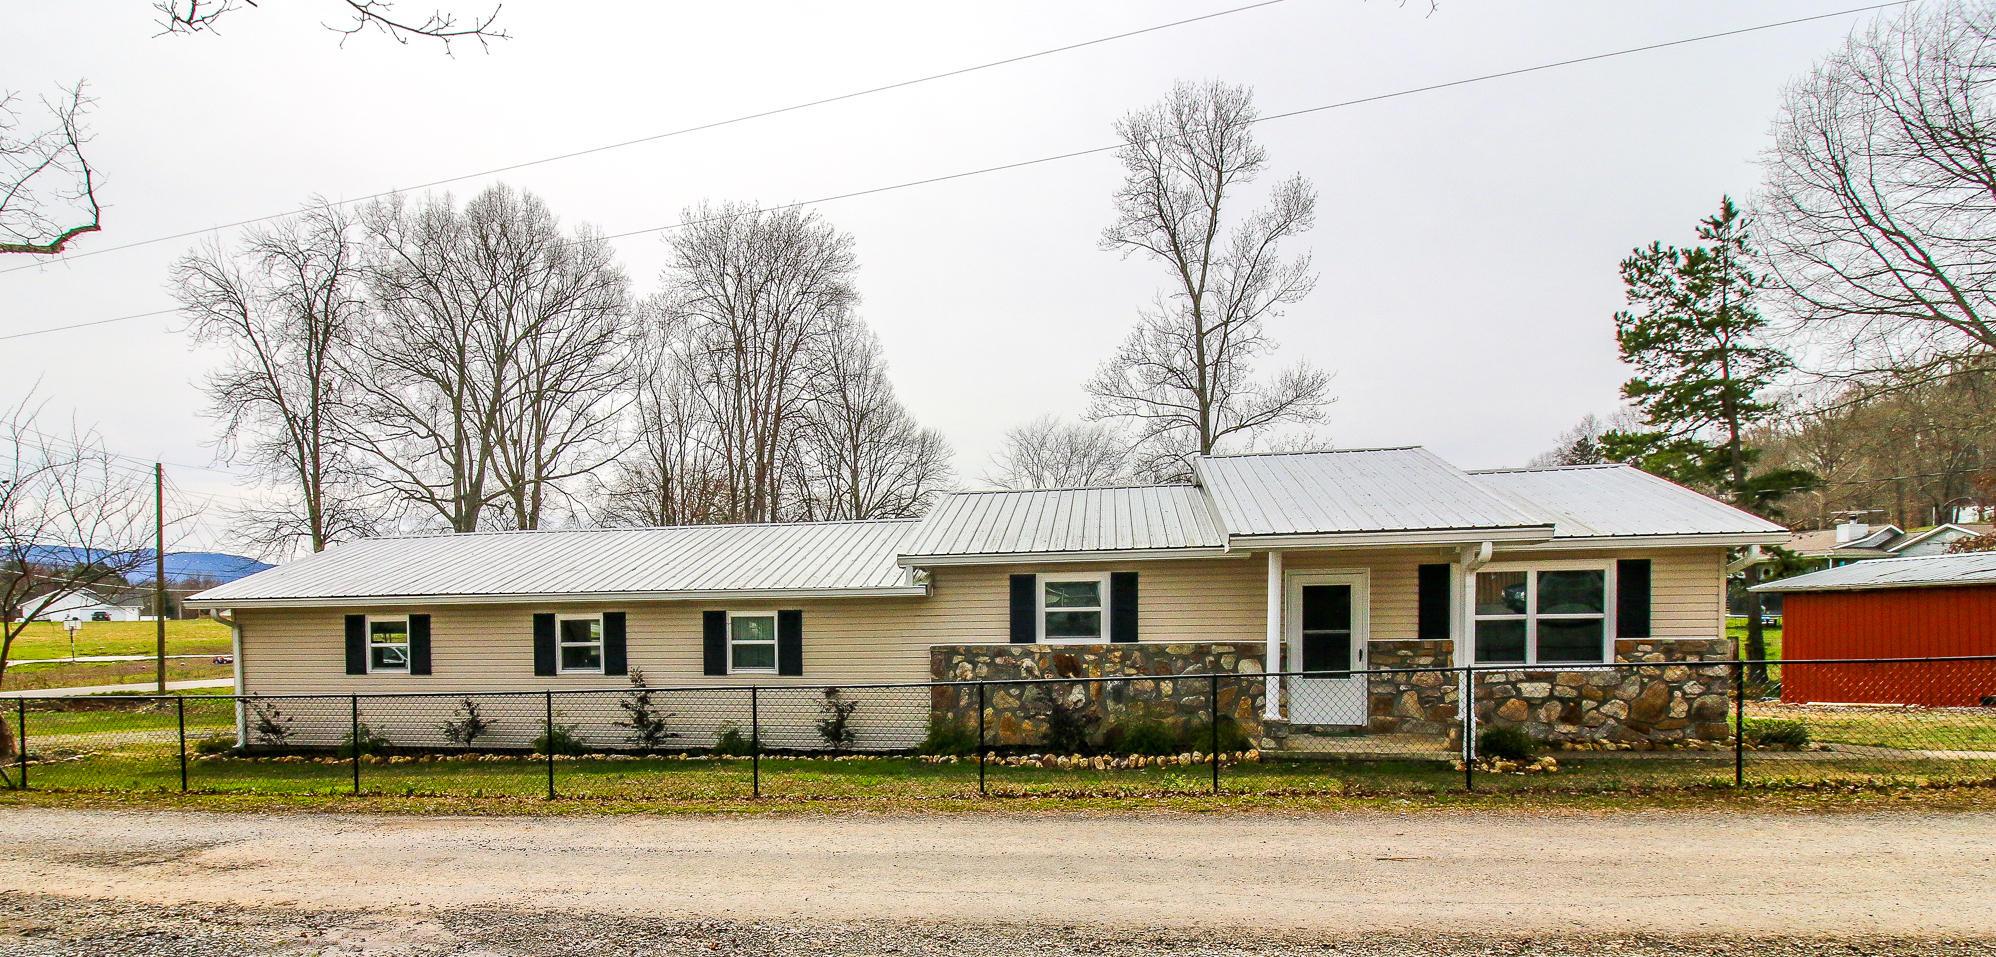 3017 Orchard Rd, Dandridge, TN 37725